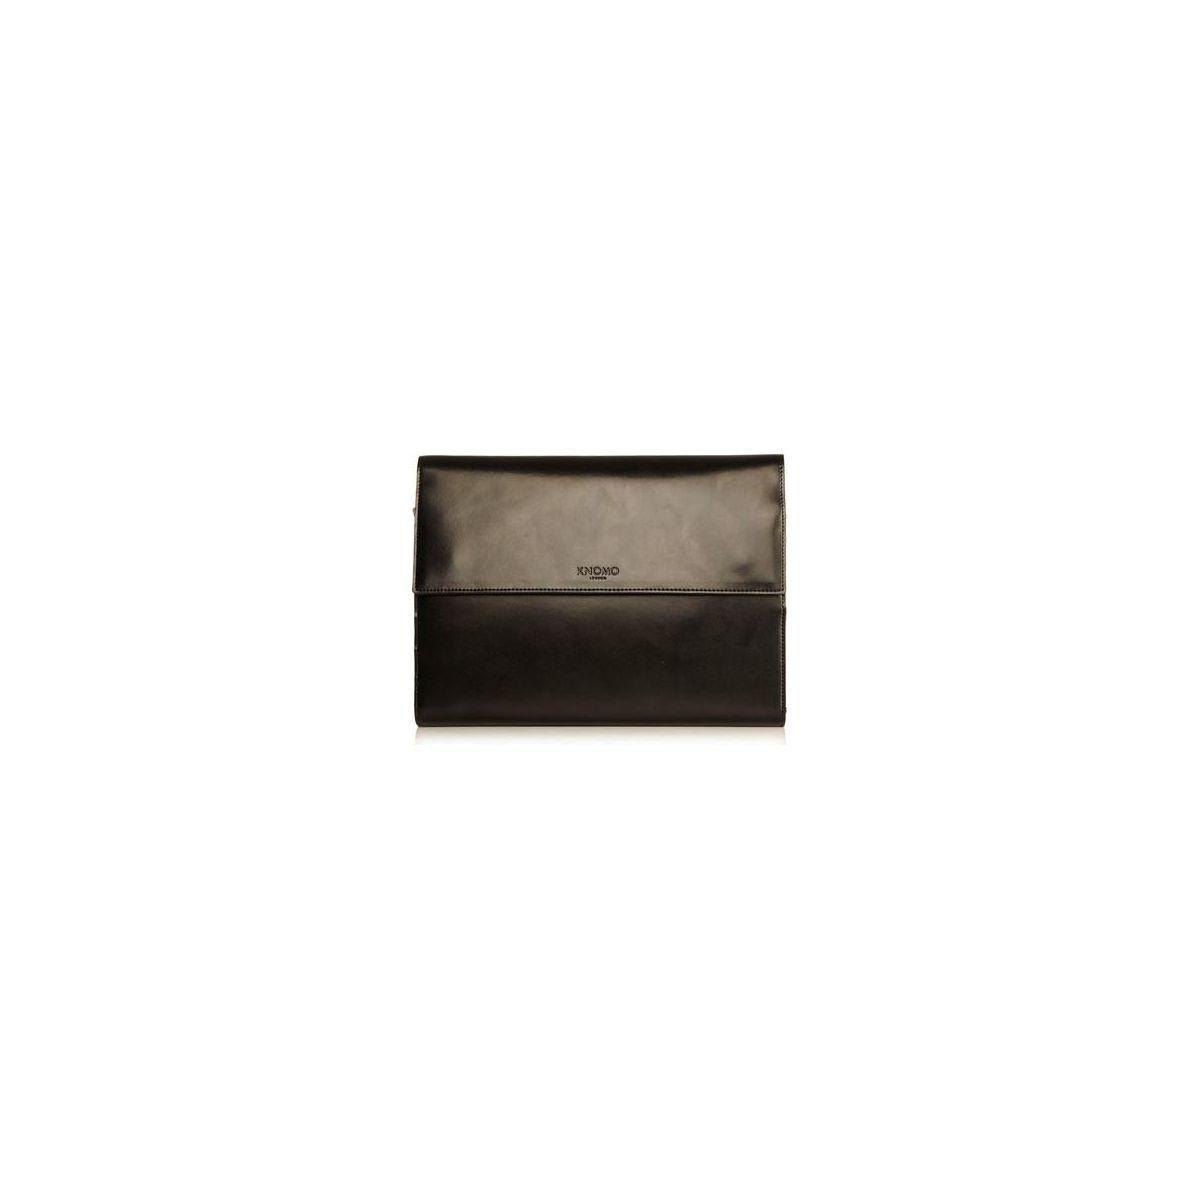 Folio knomo organizer 10' noir - 20% de remise imm�diate avec le code : priv20 (photo)